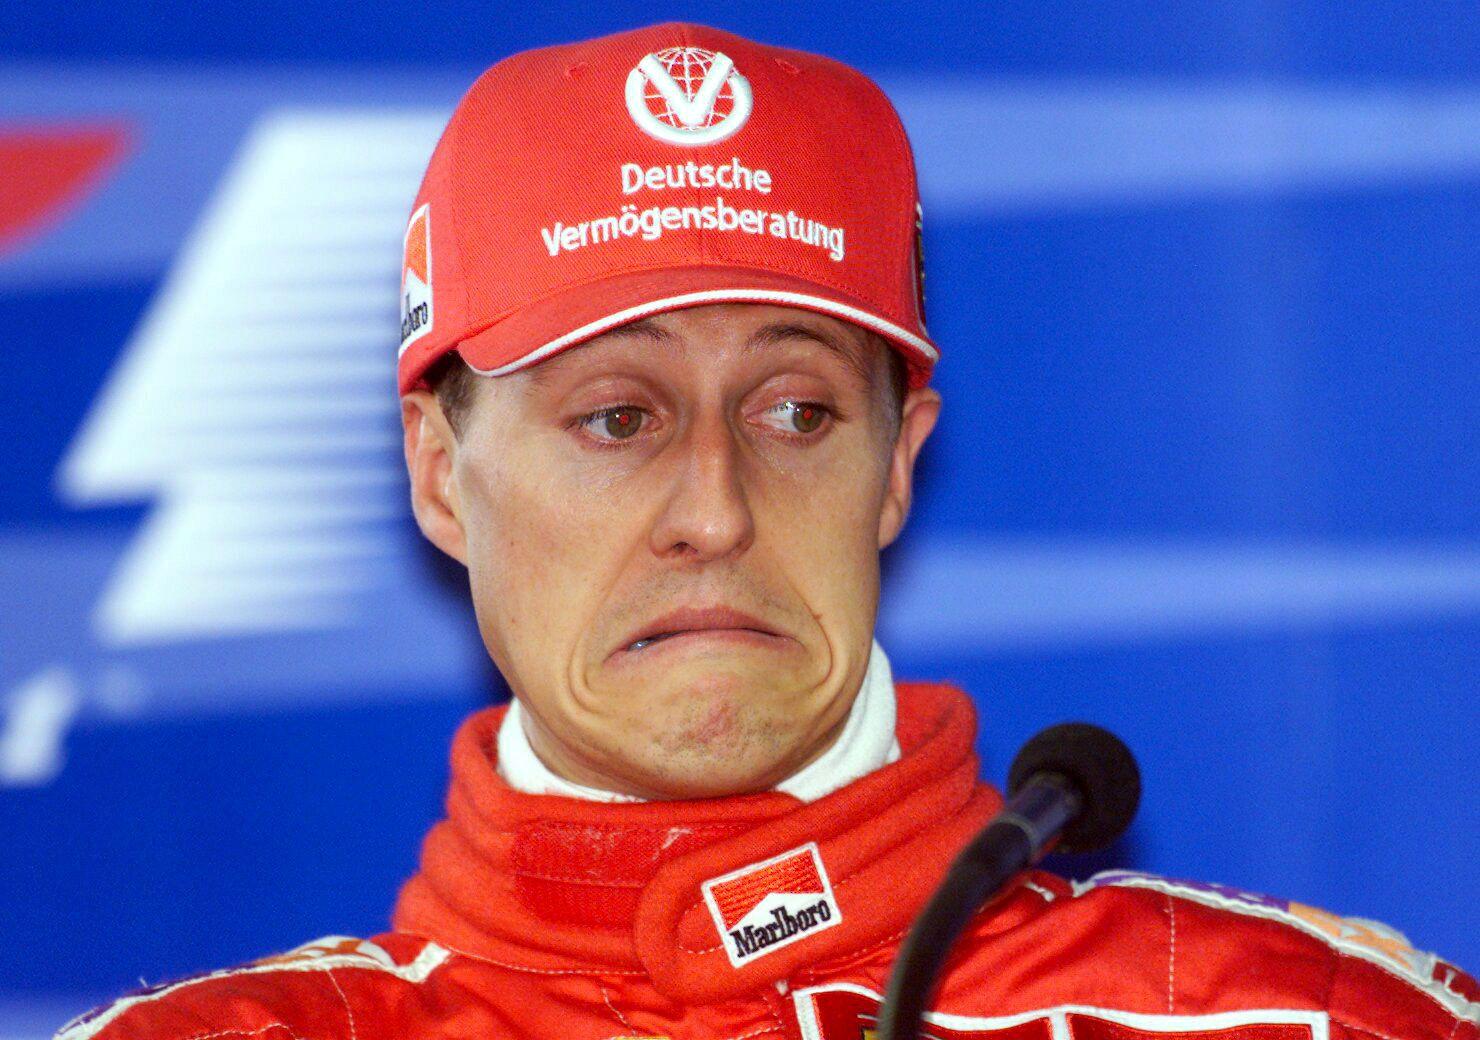 Felipe Massa dio detalles de aquel episodio de Schumacher en Mónaco 2006 (Foto: Reuters)